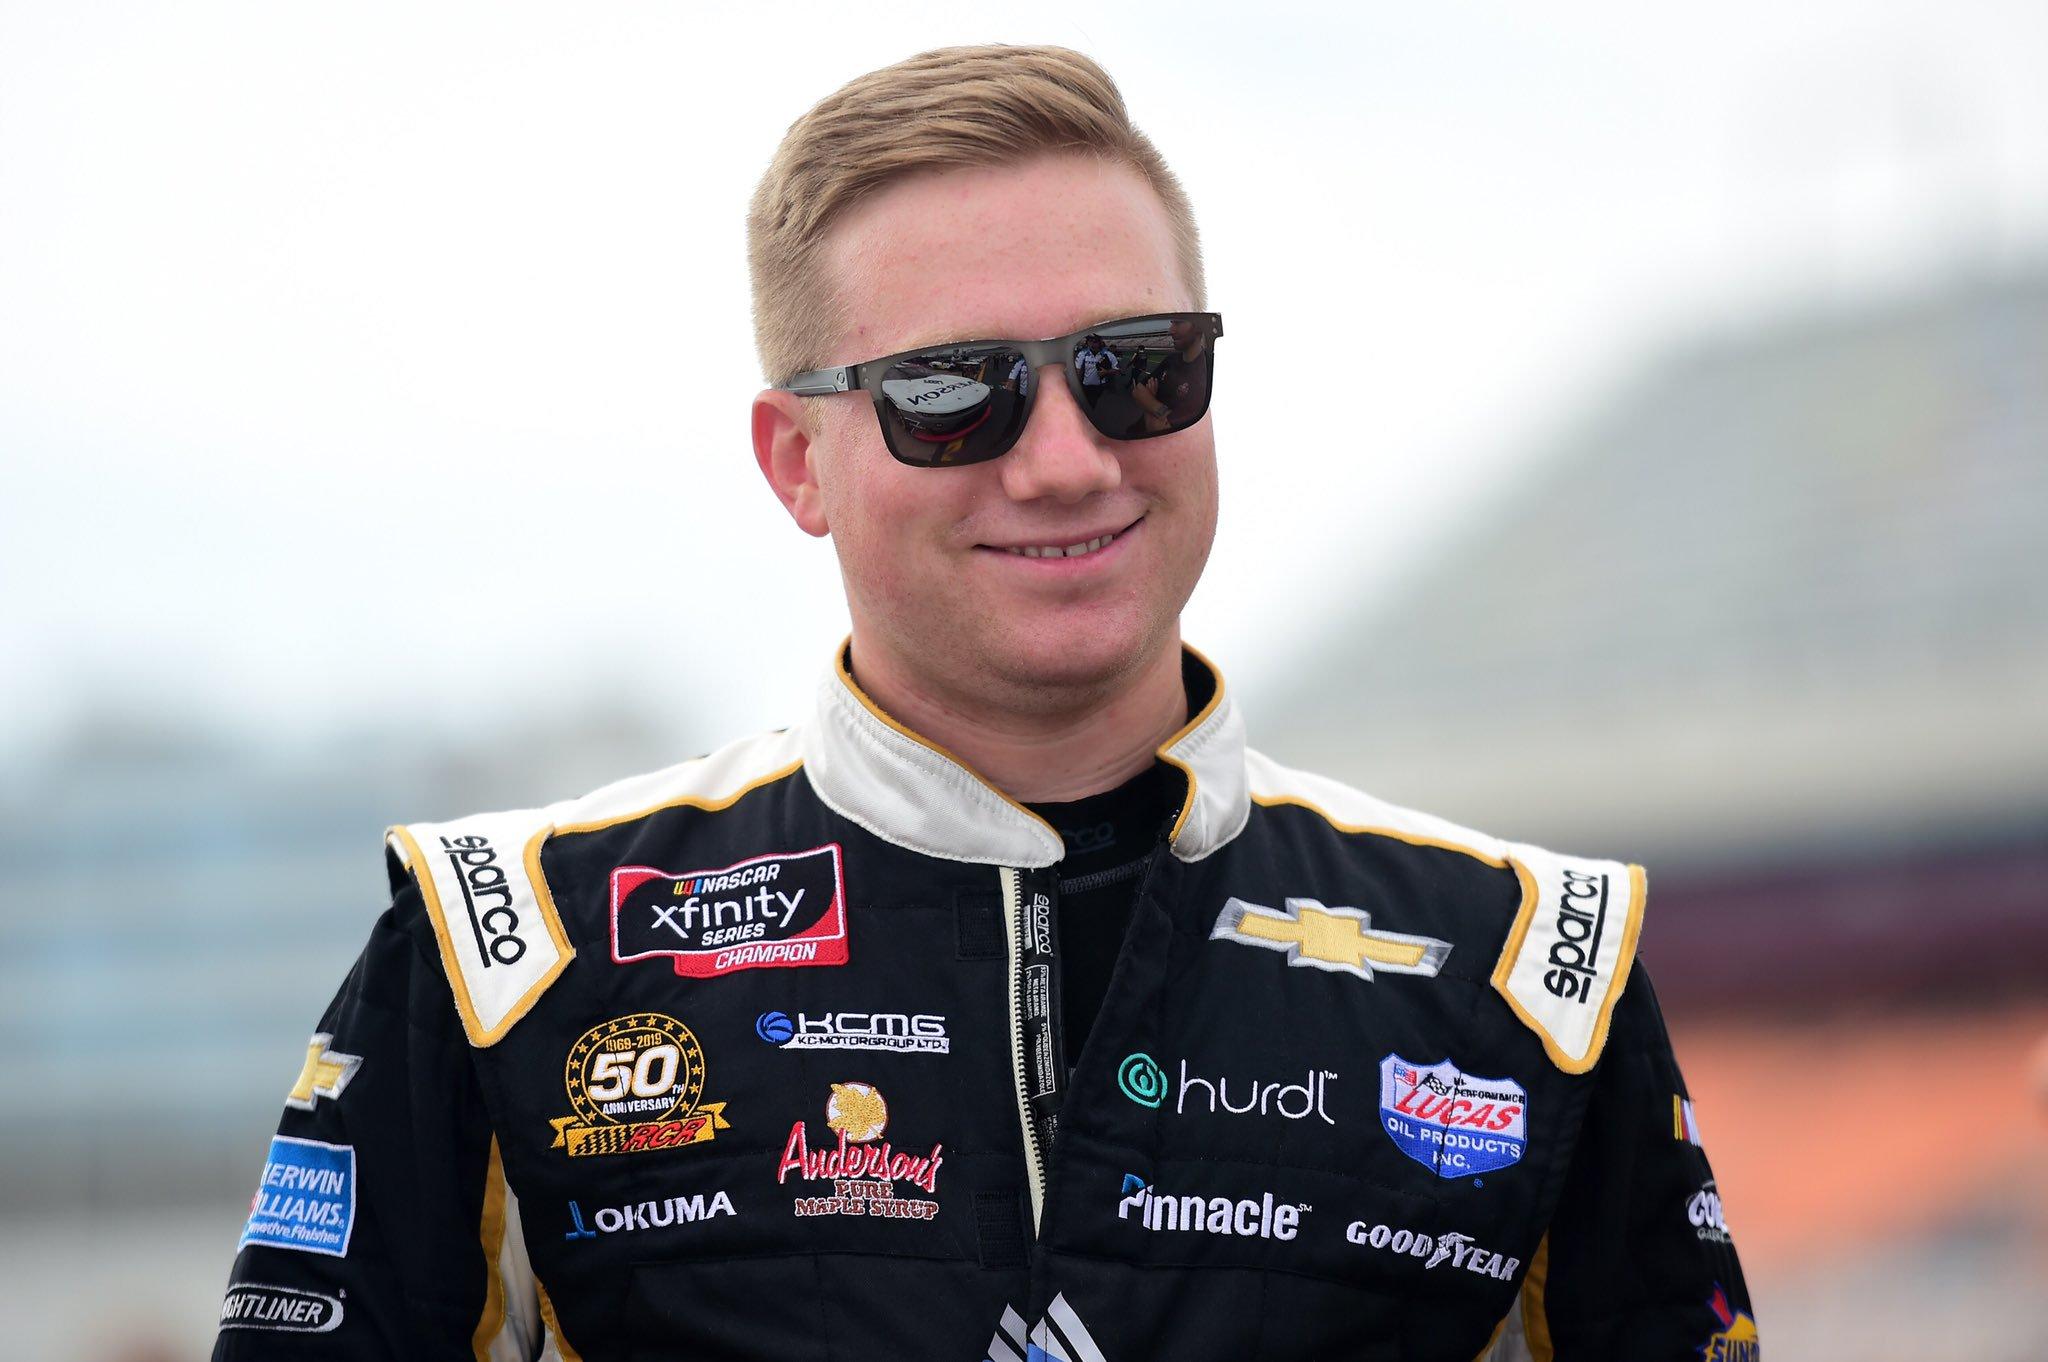 Tyler Reddick to Richard Childress Racing 8 Car for 2020